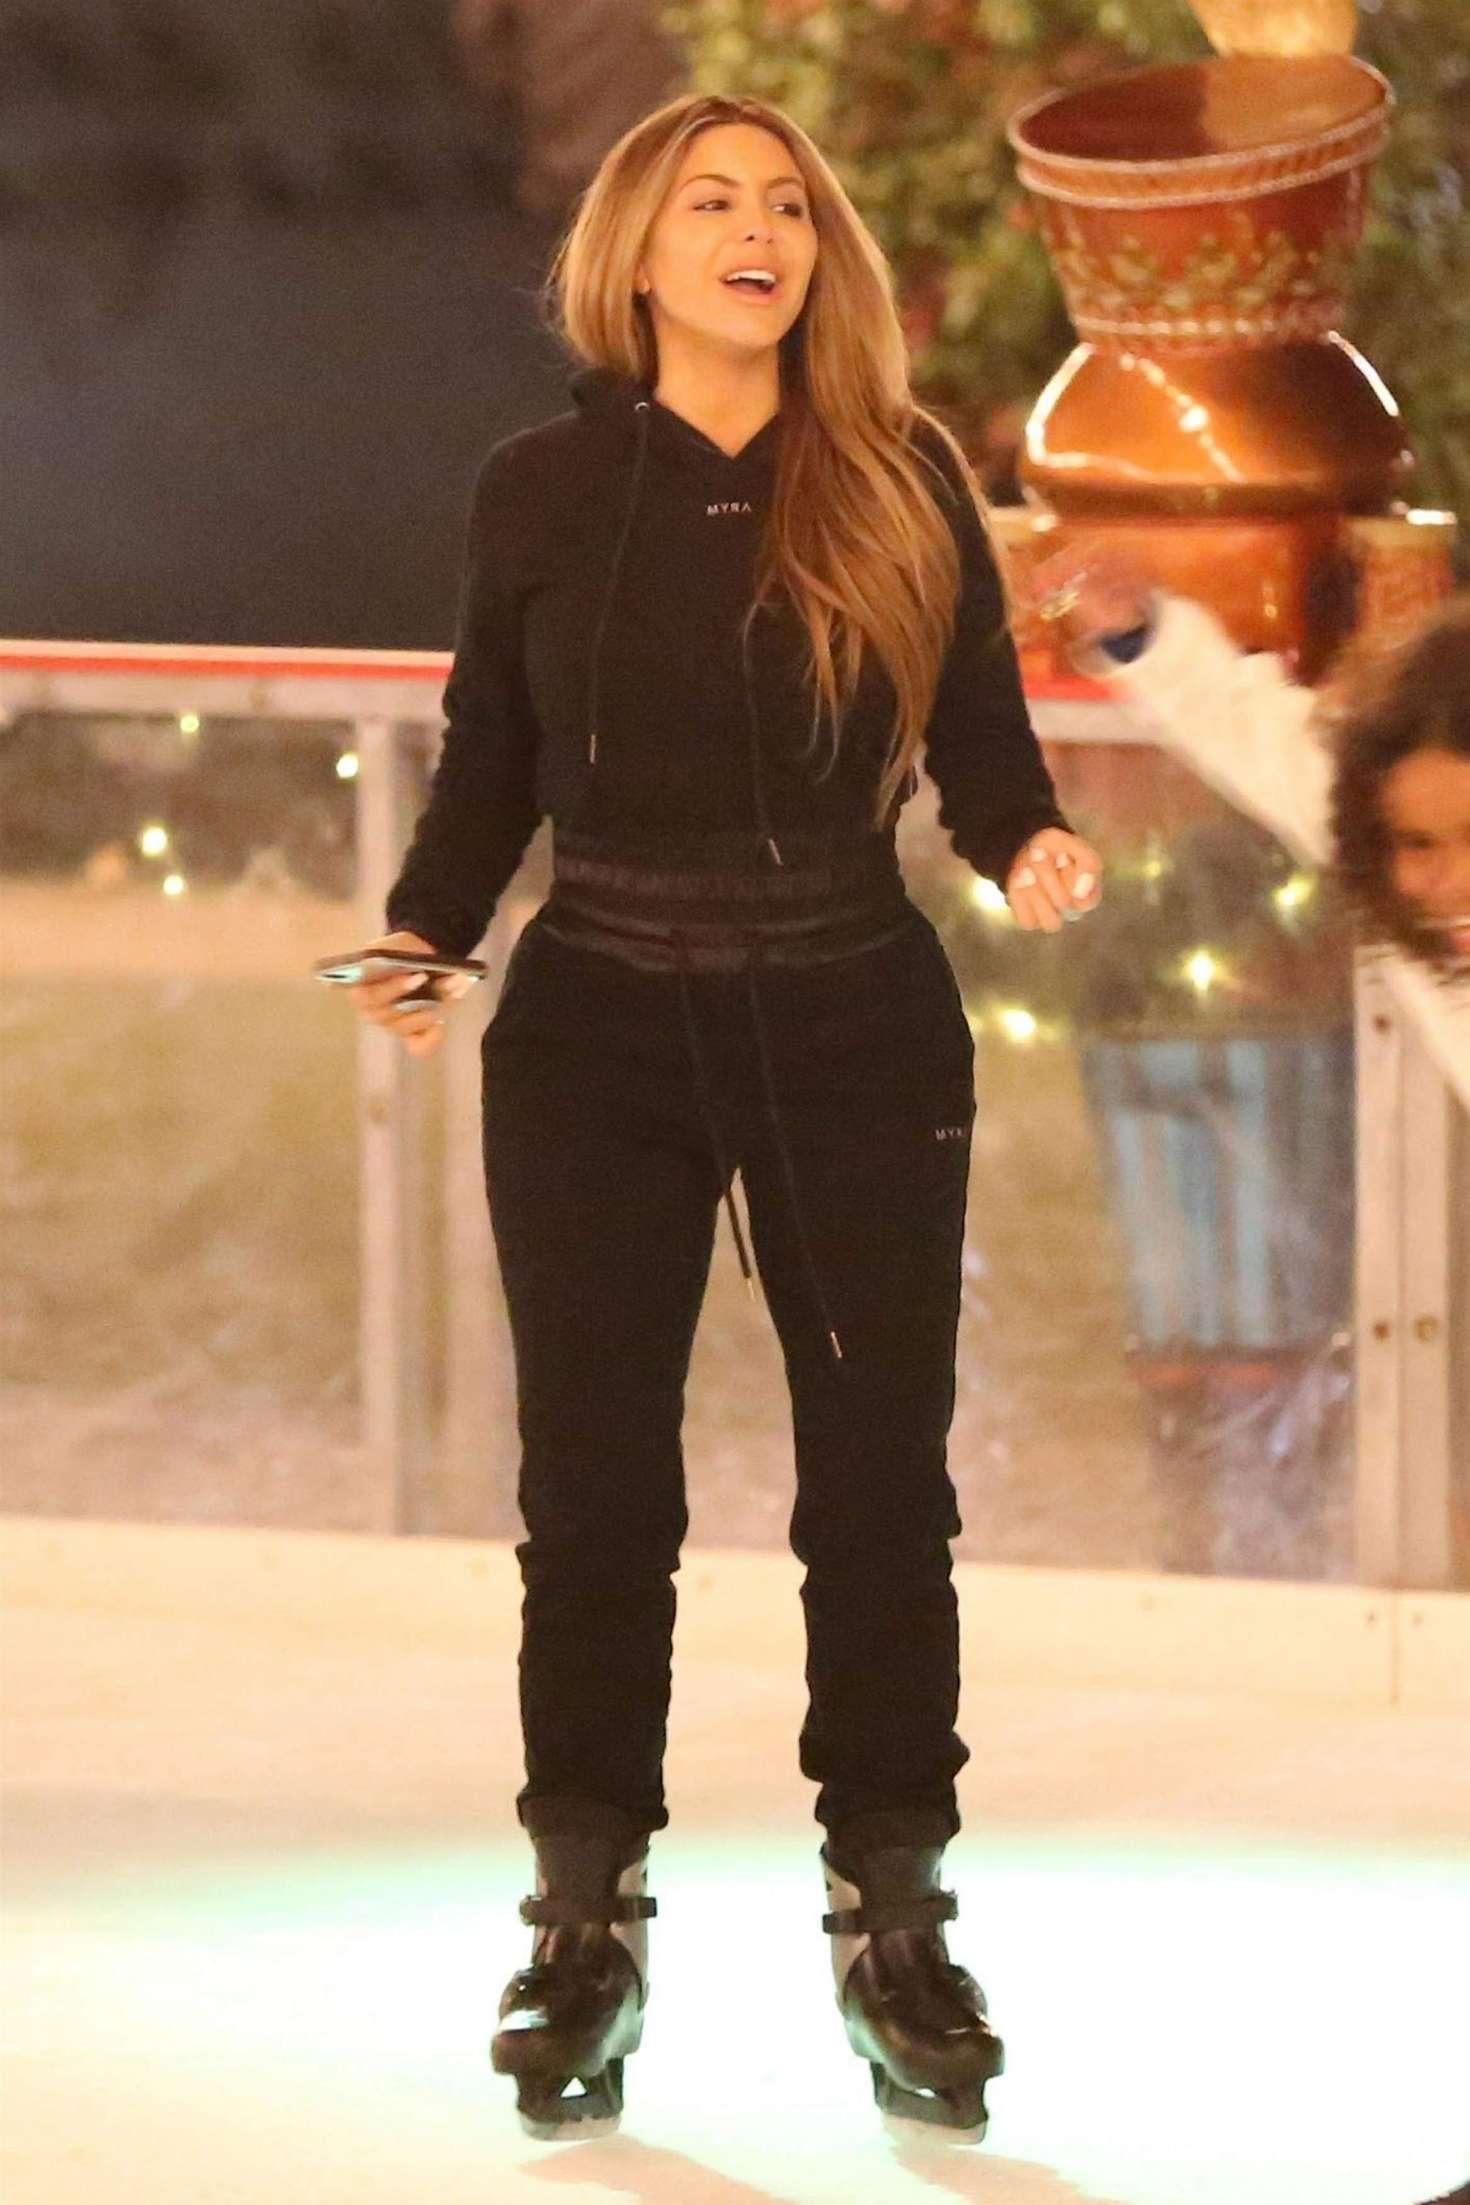 Kourtney Kardashian and Larsa Pippen – Ice skating in Los Angeles